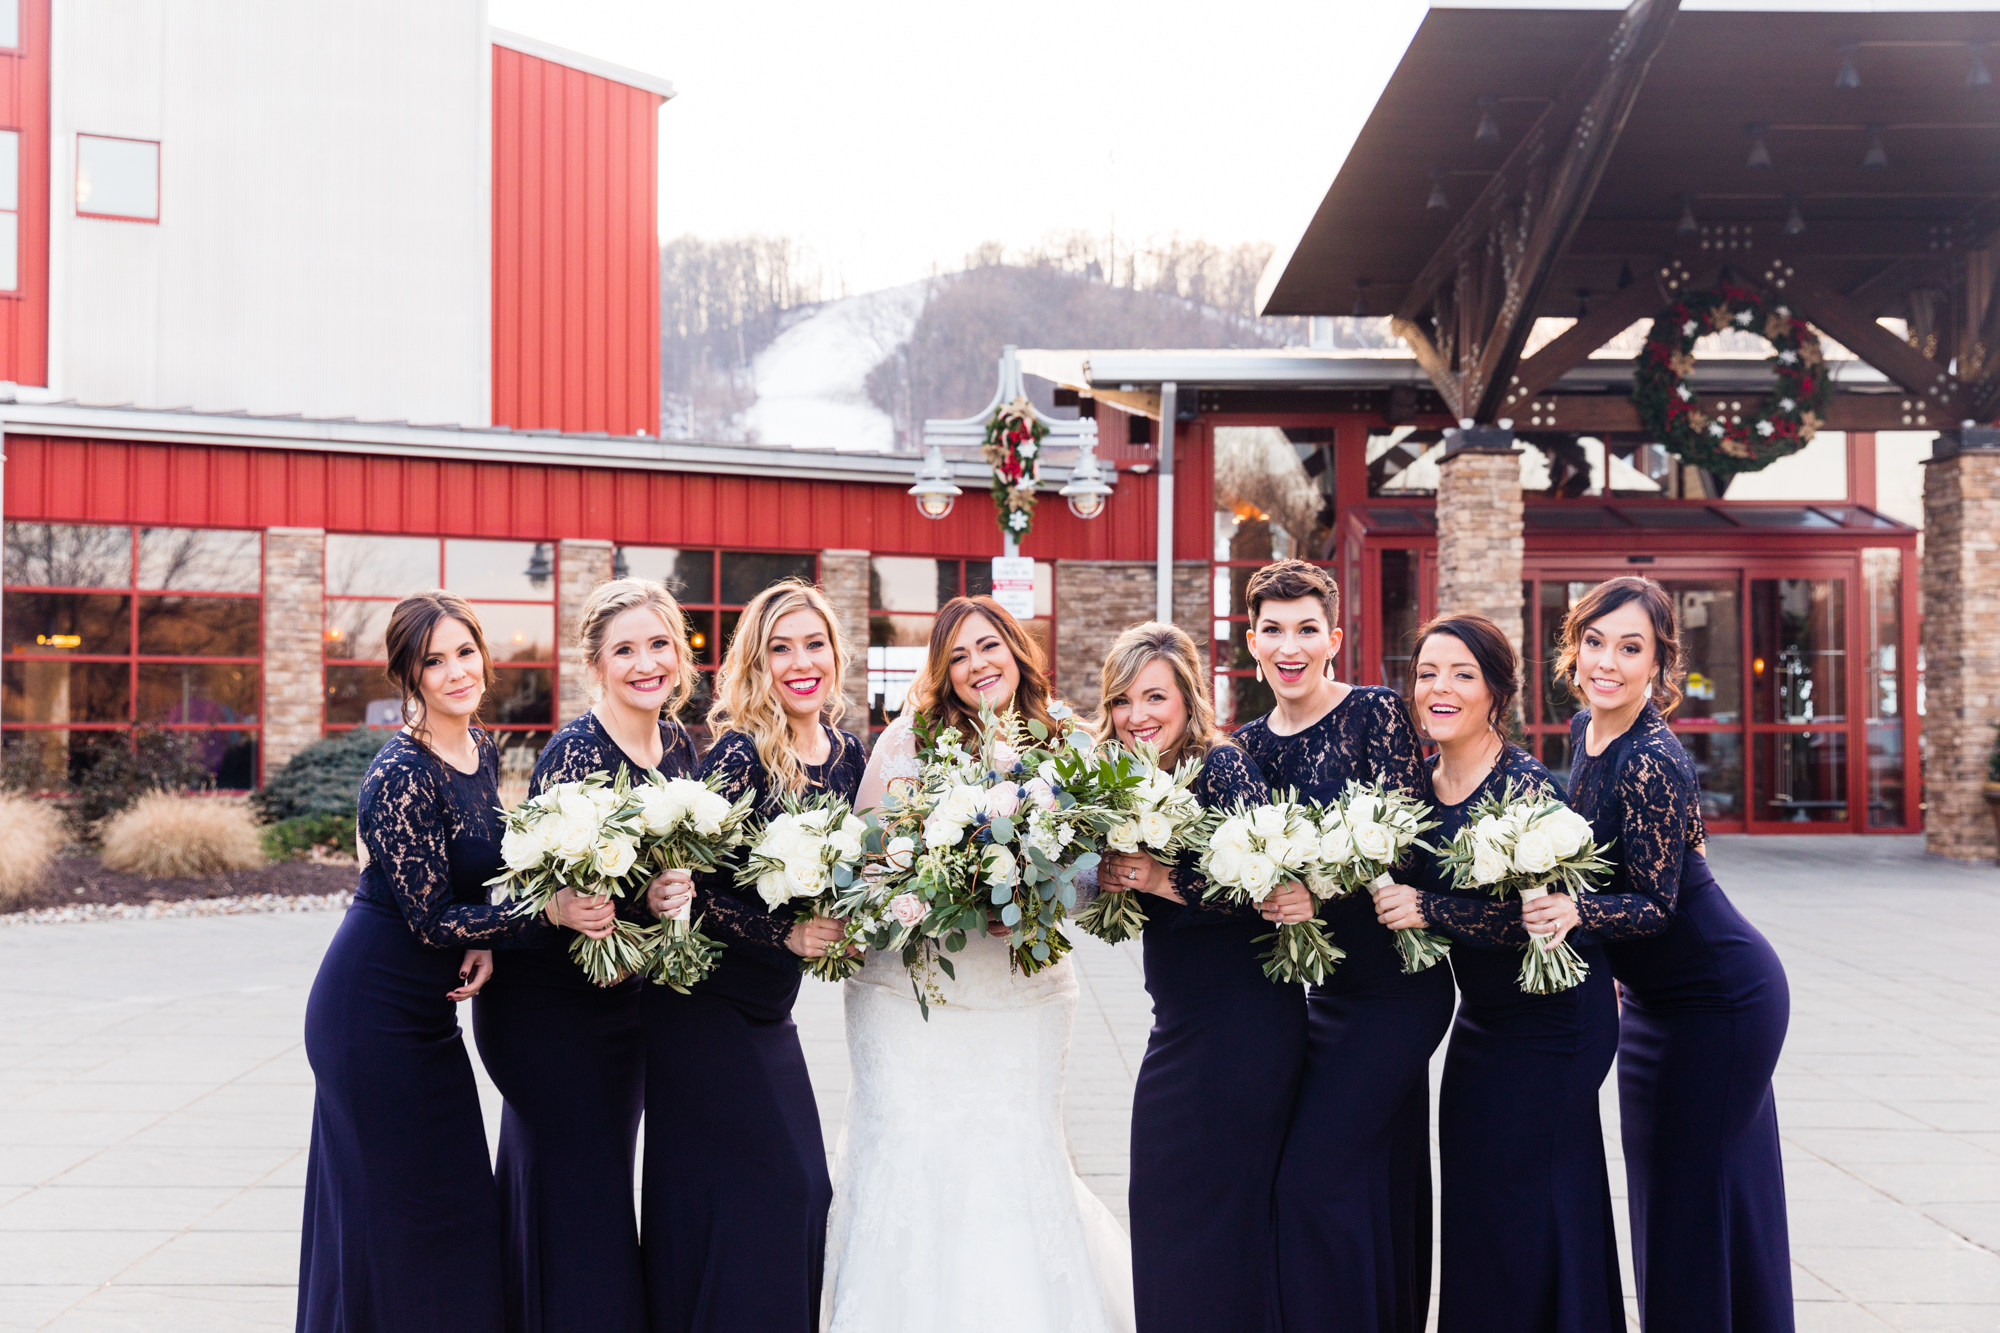 Bear Creek Mountain Resort Wedding Photography - Lovestruck Pictures-048.jpg